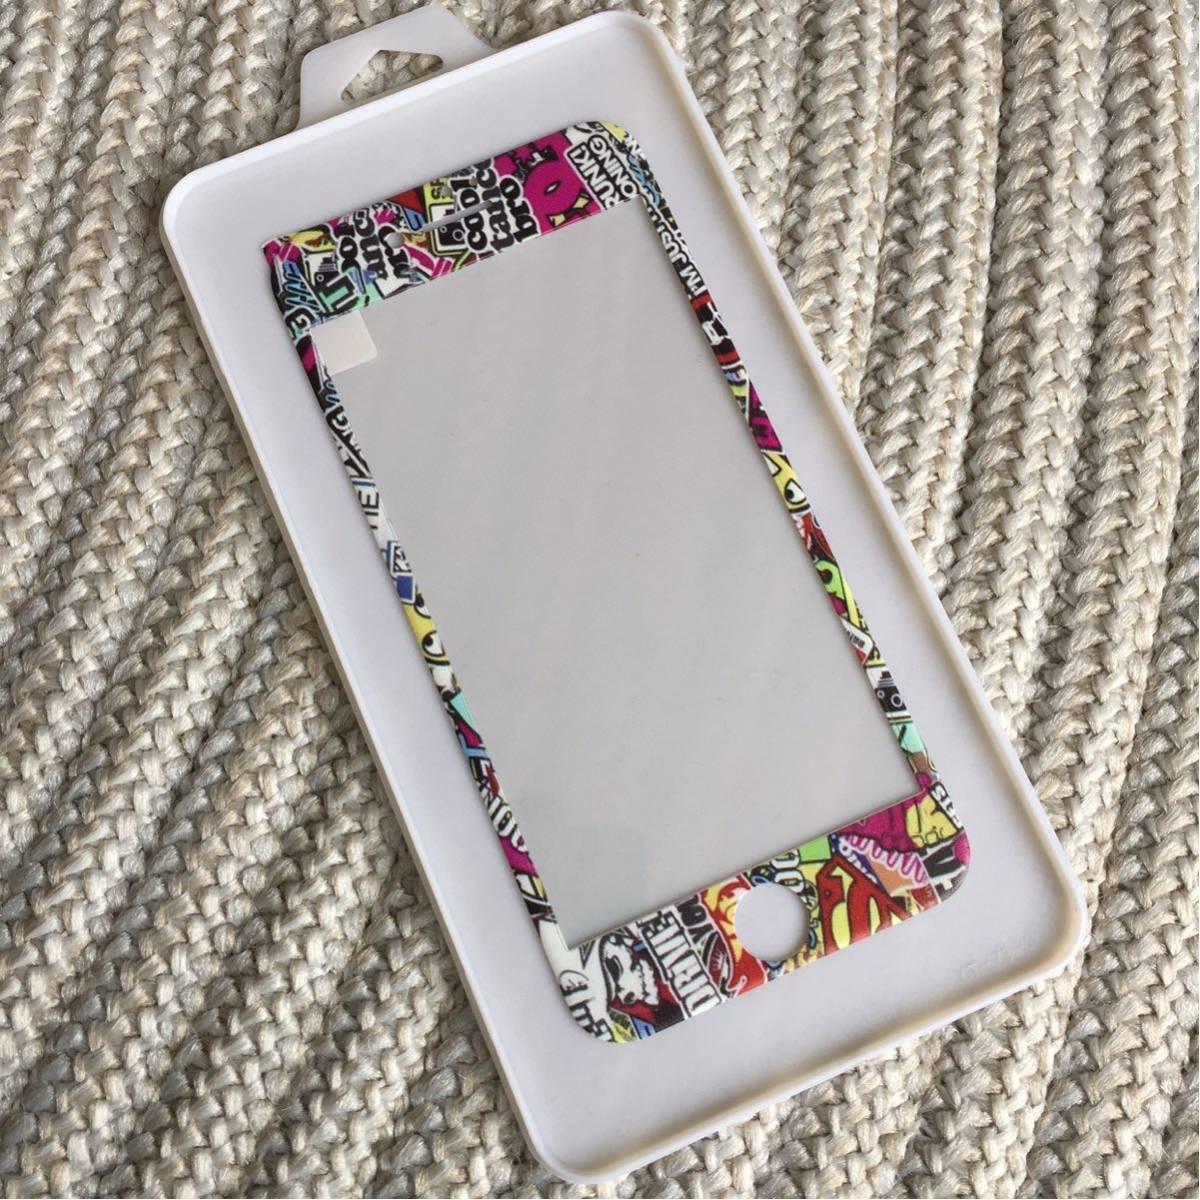 3234d714bb ガラス ボムステッカー プロテクター iPhoneケース iPhone7 iPhone8 USDM JDM ローライダー チョッパー ホットロッド  ホットウィール